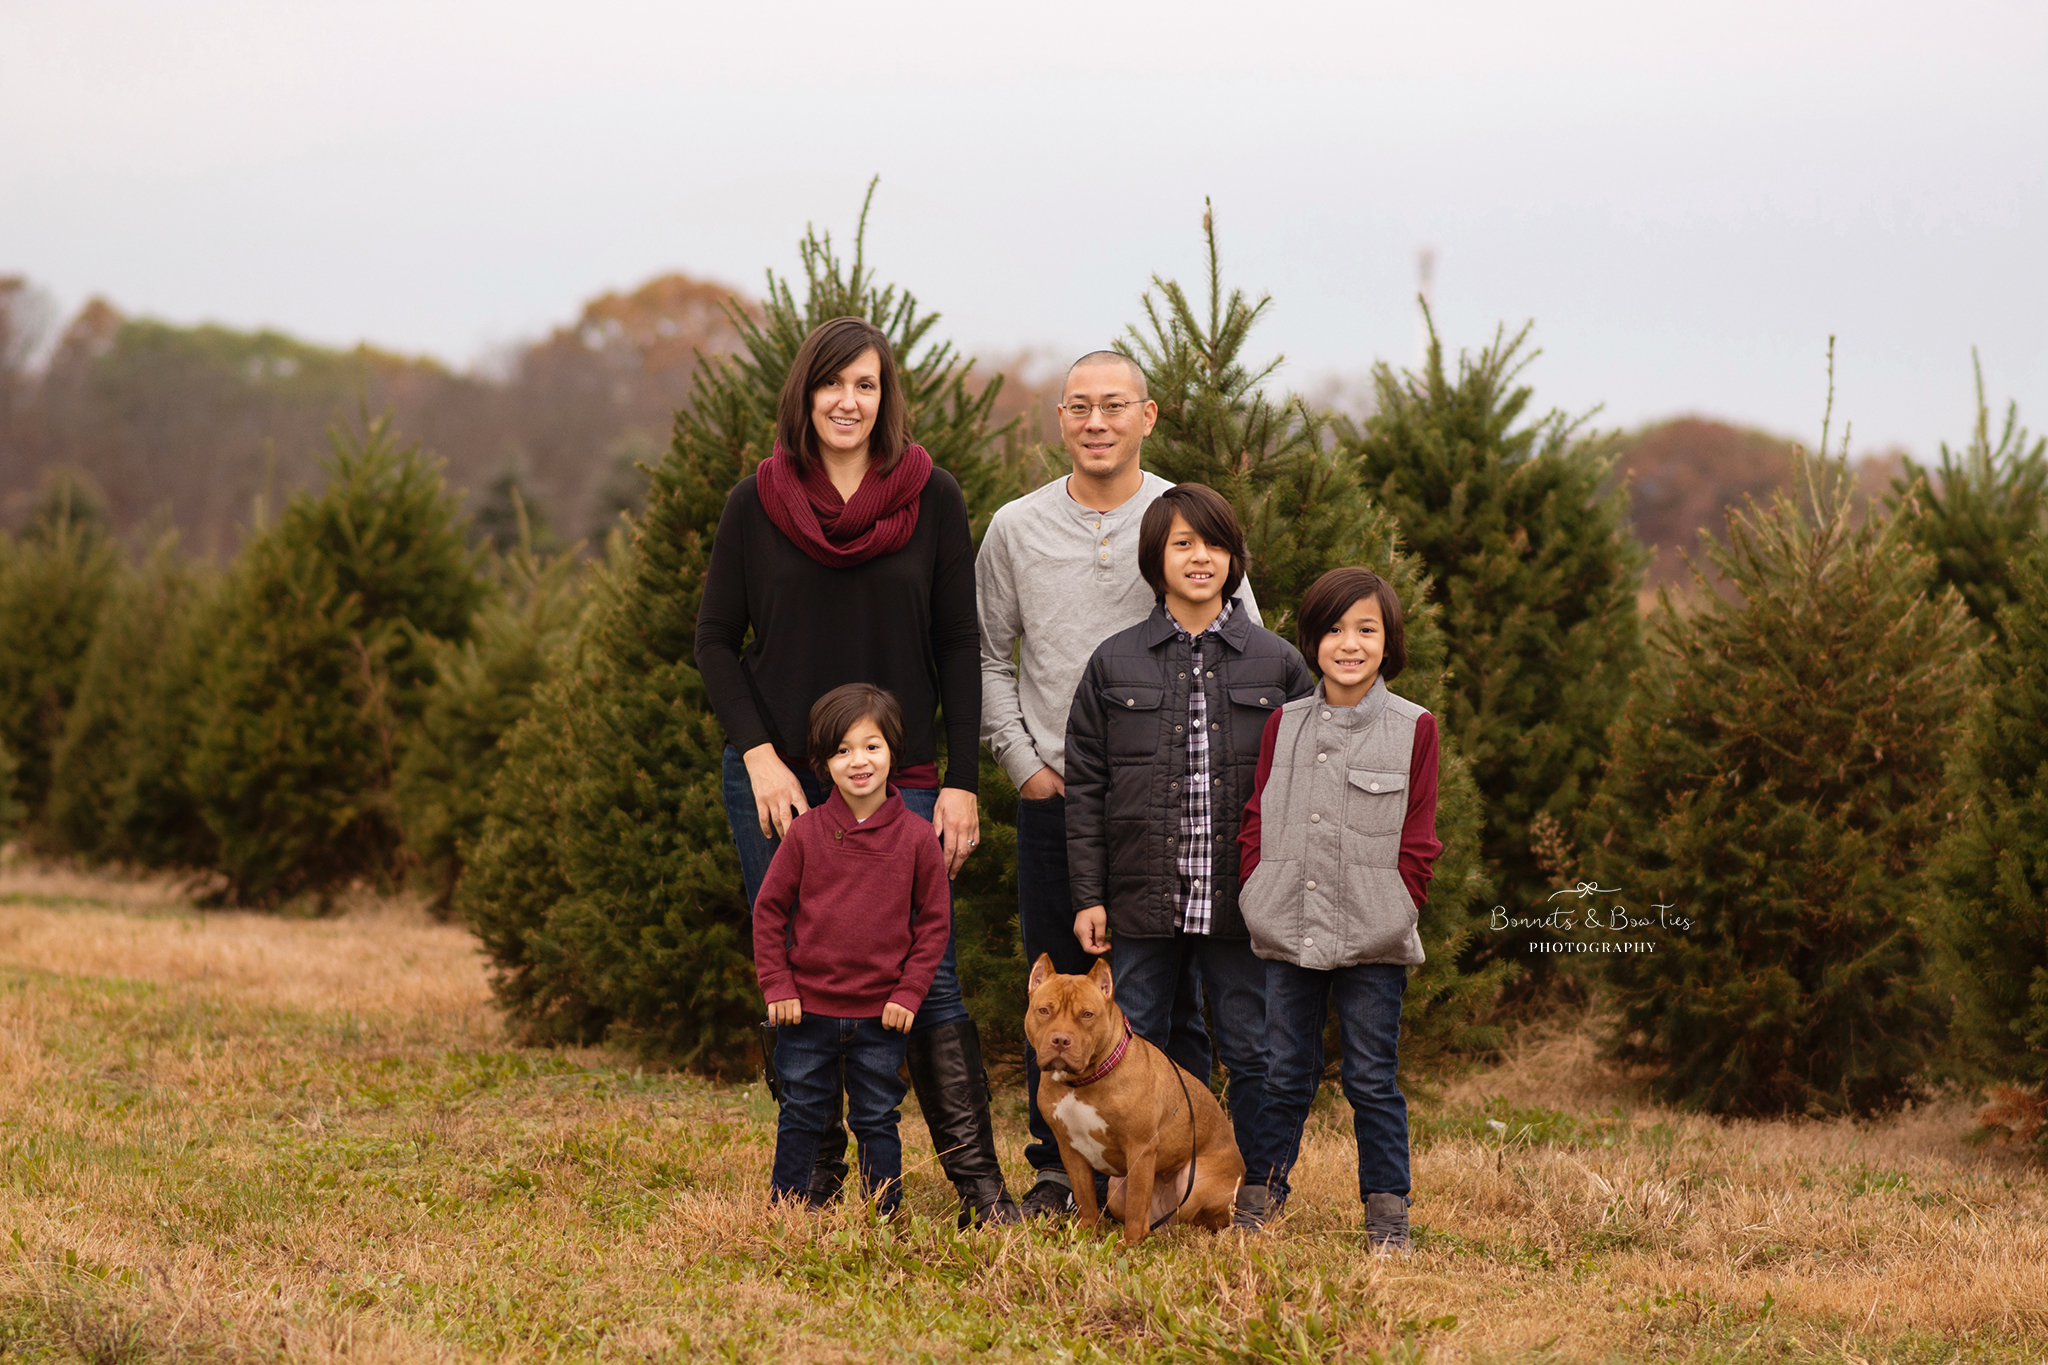 haring tree farm session goldsboro pa.jpg